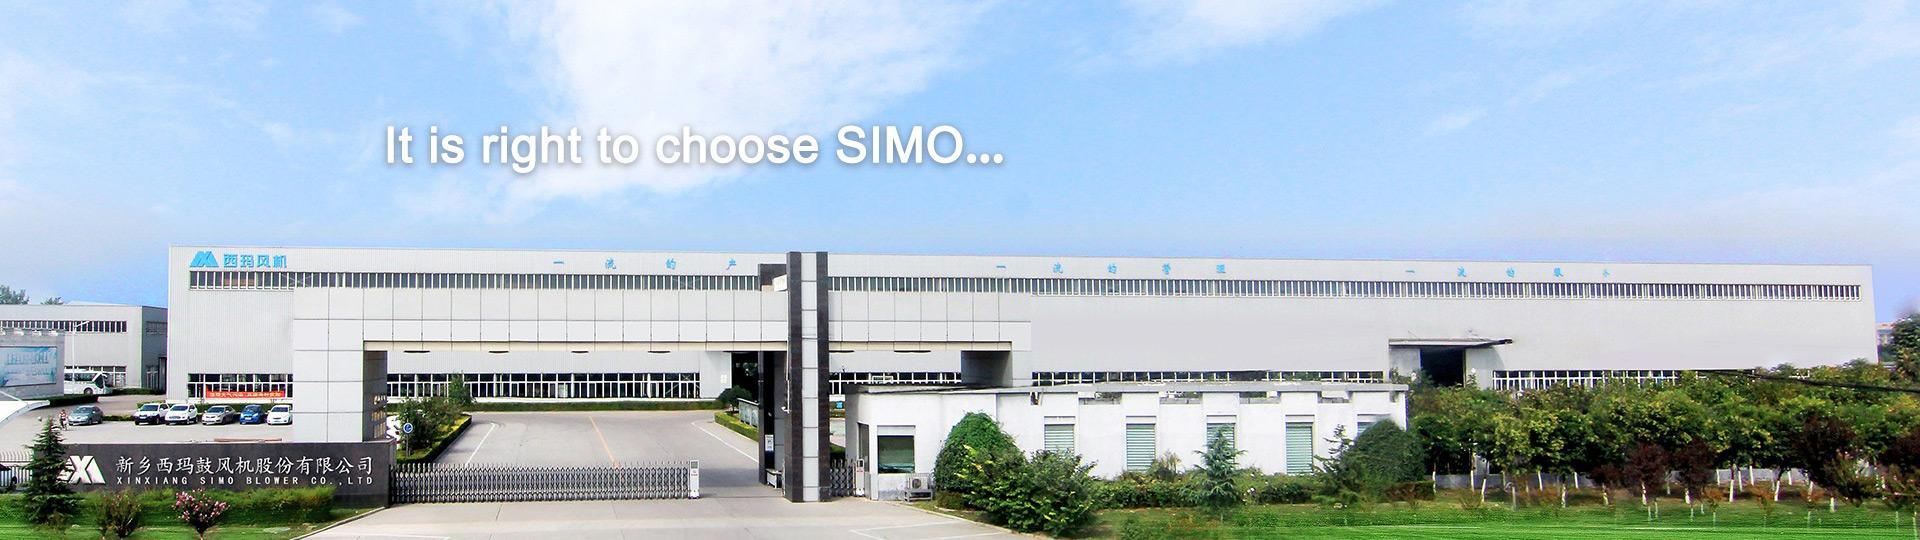 Industrial Centrifugal Fan Manufacturer Simoblower